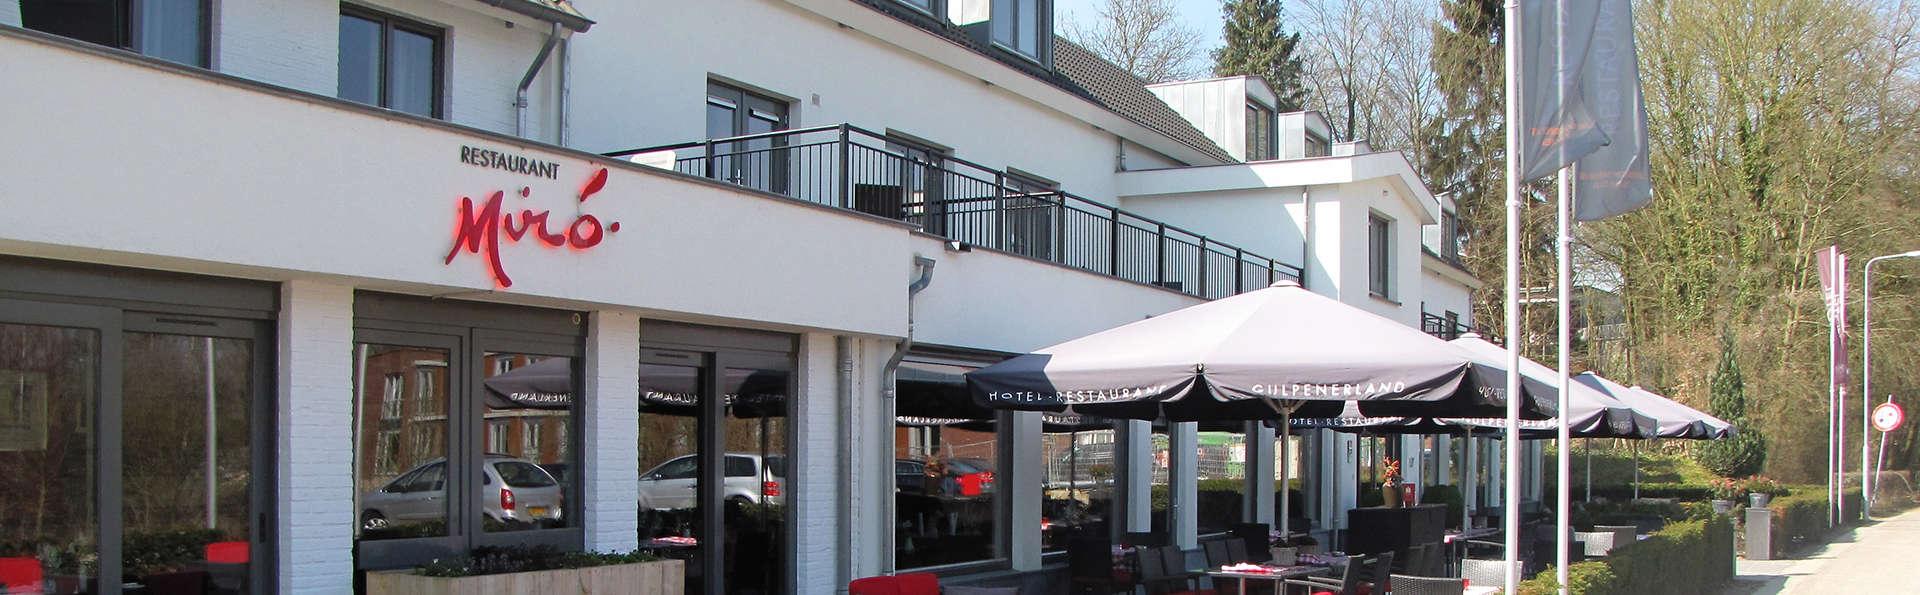 Saillant Hotel Gulpenerland - edit_front.jpg